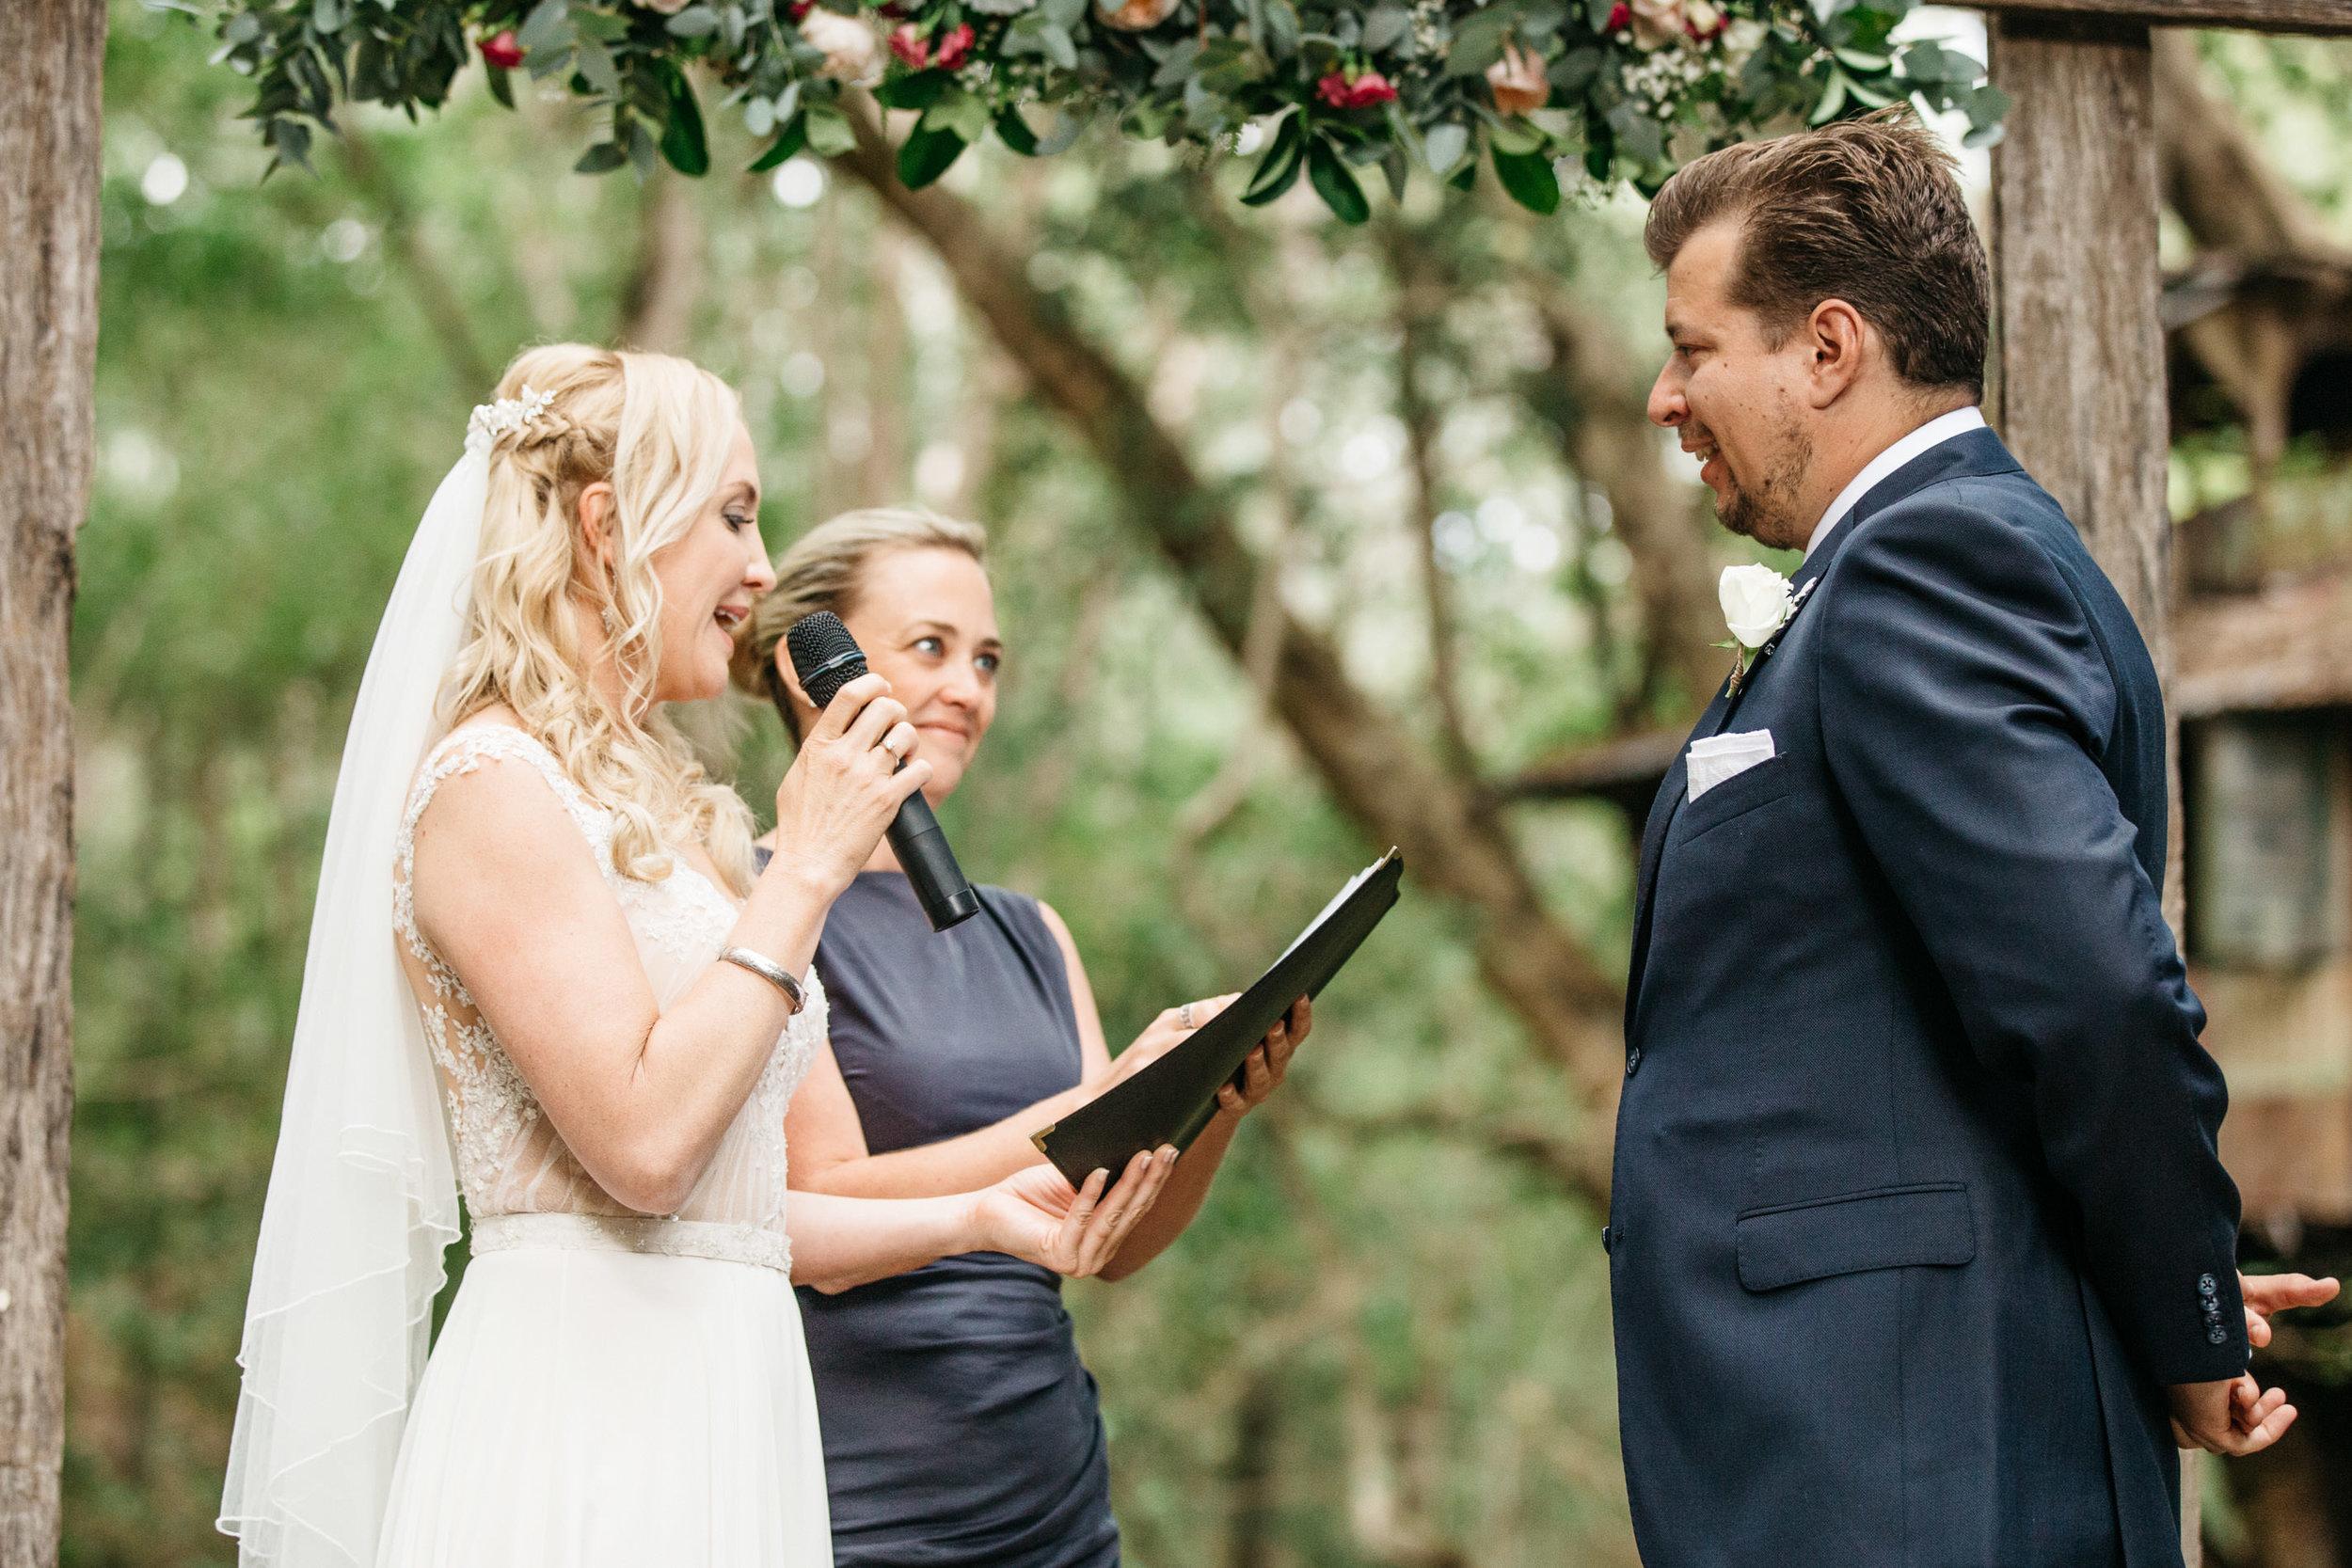 True North Photography_Boomerang Farm_Stacey and Isaac_Gold Coast Wedding_Barm Wedding_Hinterland Wedding-97.jpg